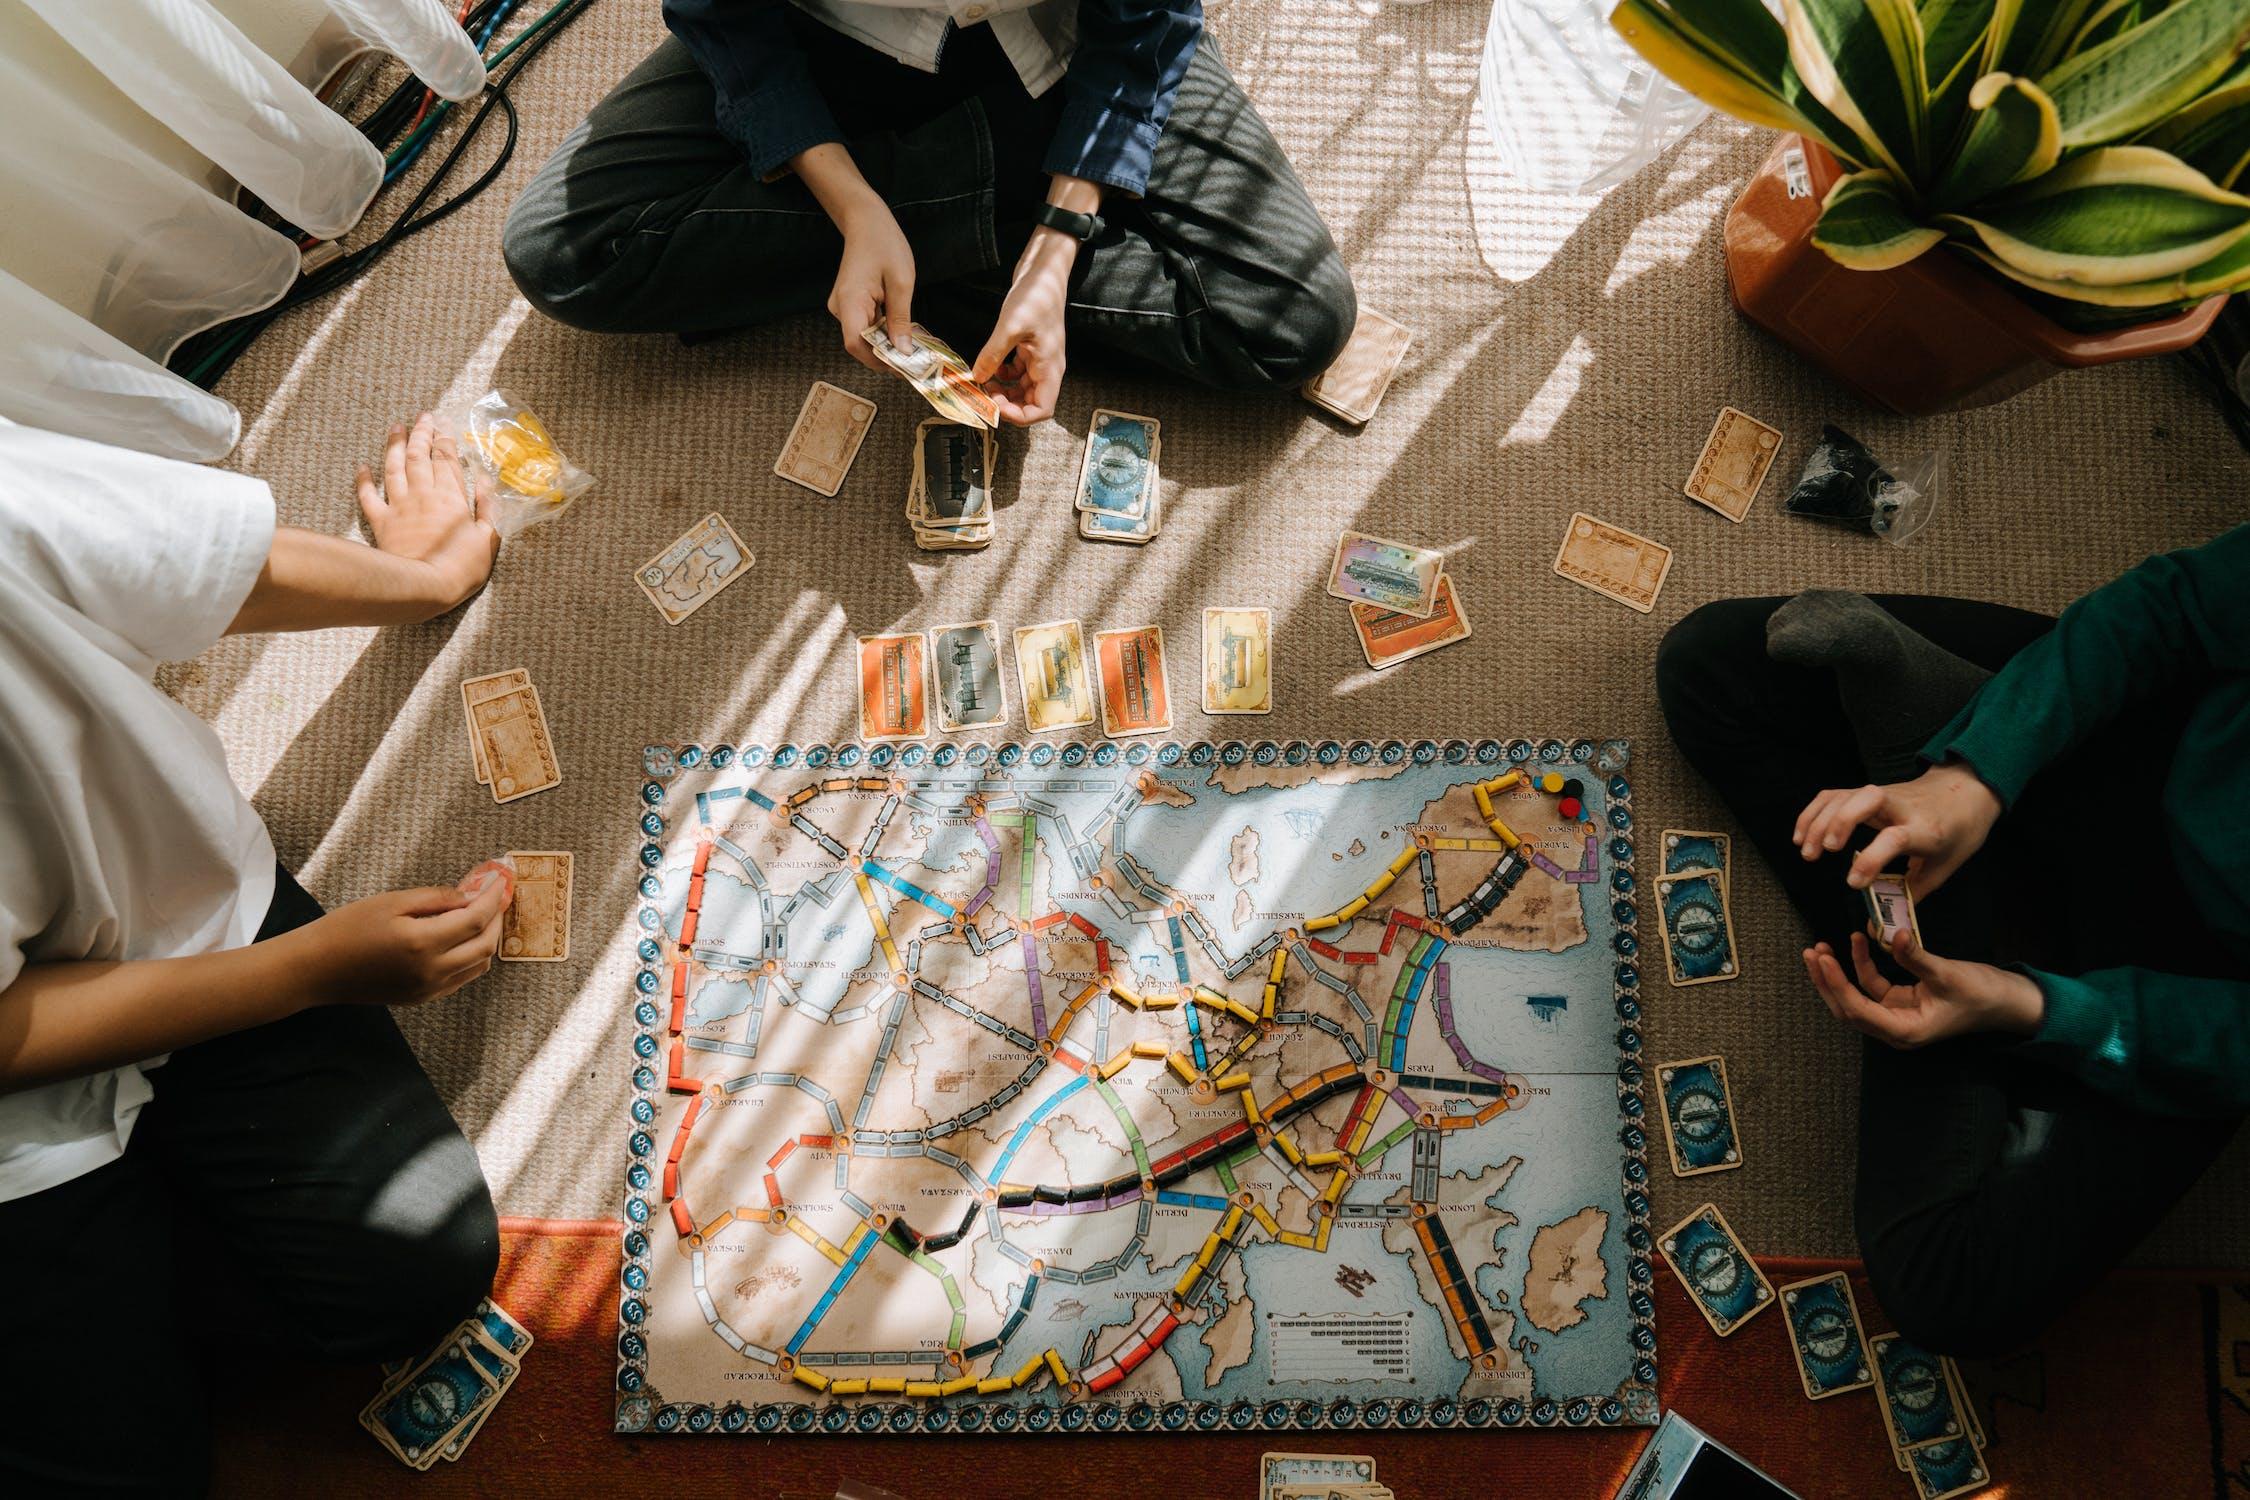 Desková hra Ticket to Ride s dobou hraní okolo 1h